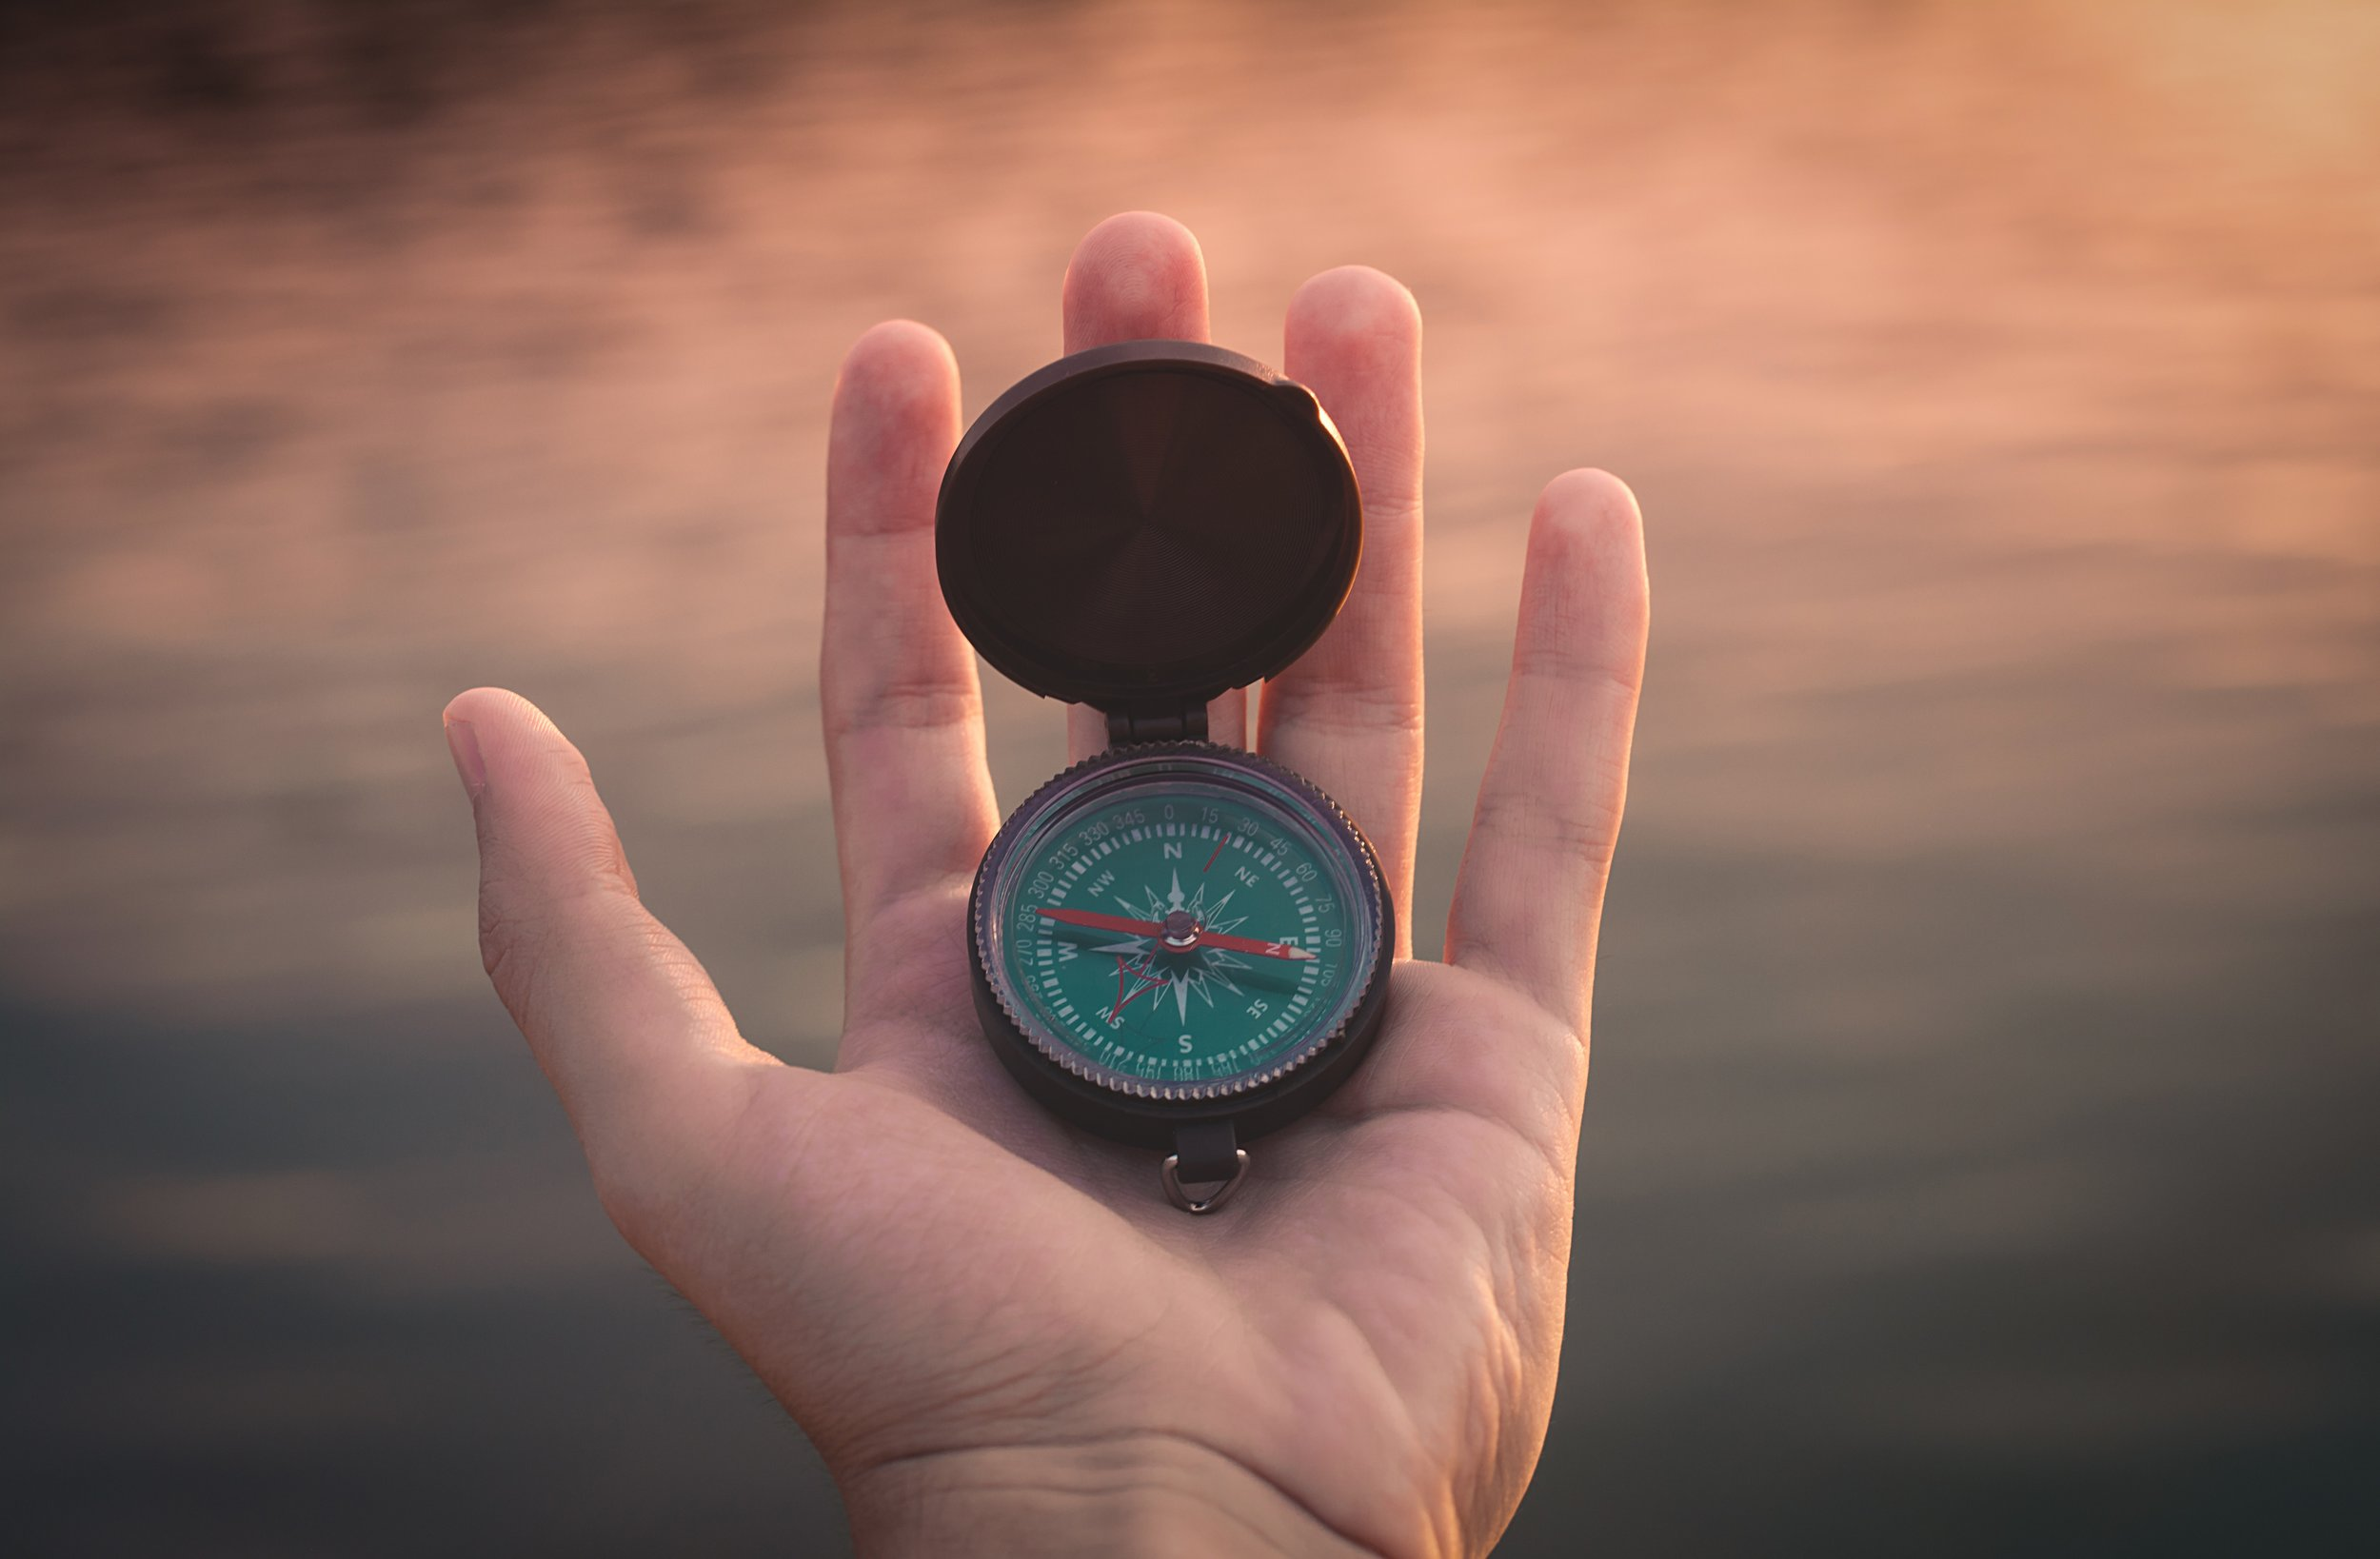 compass uros-jovicic-320023-unsplash.jpg